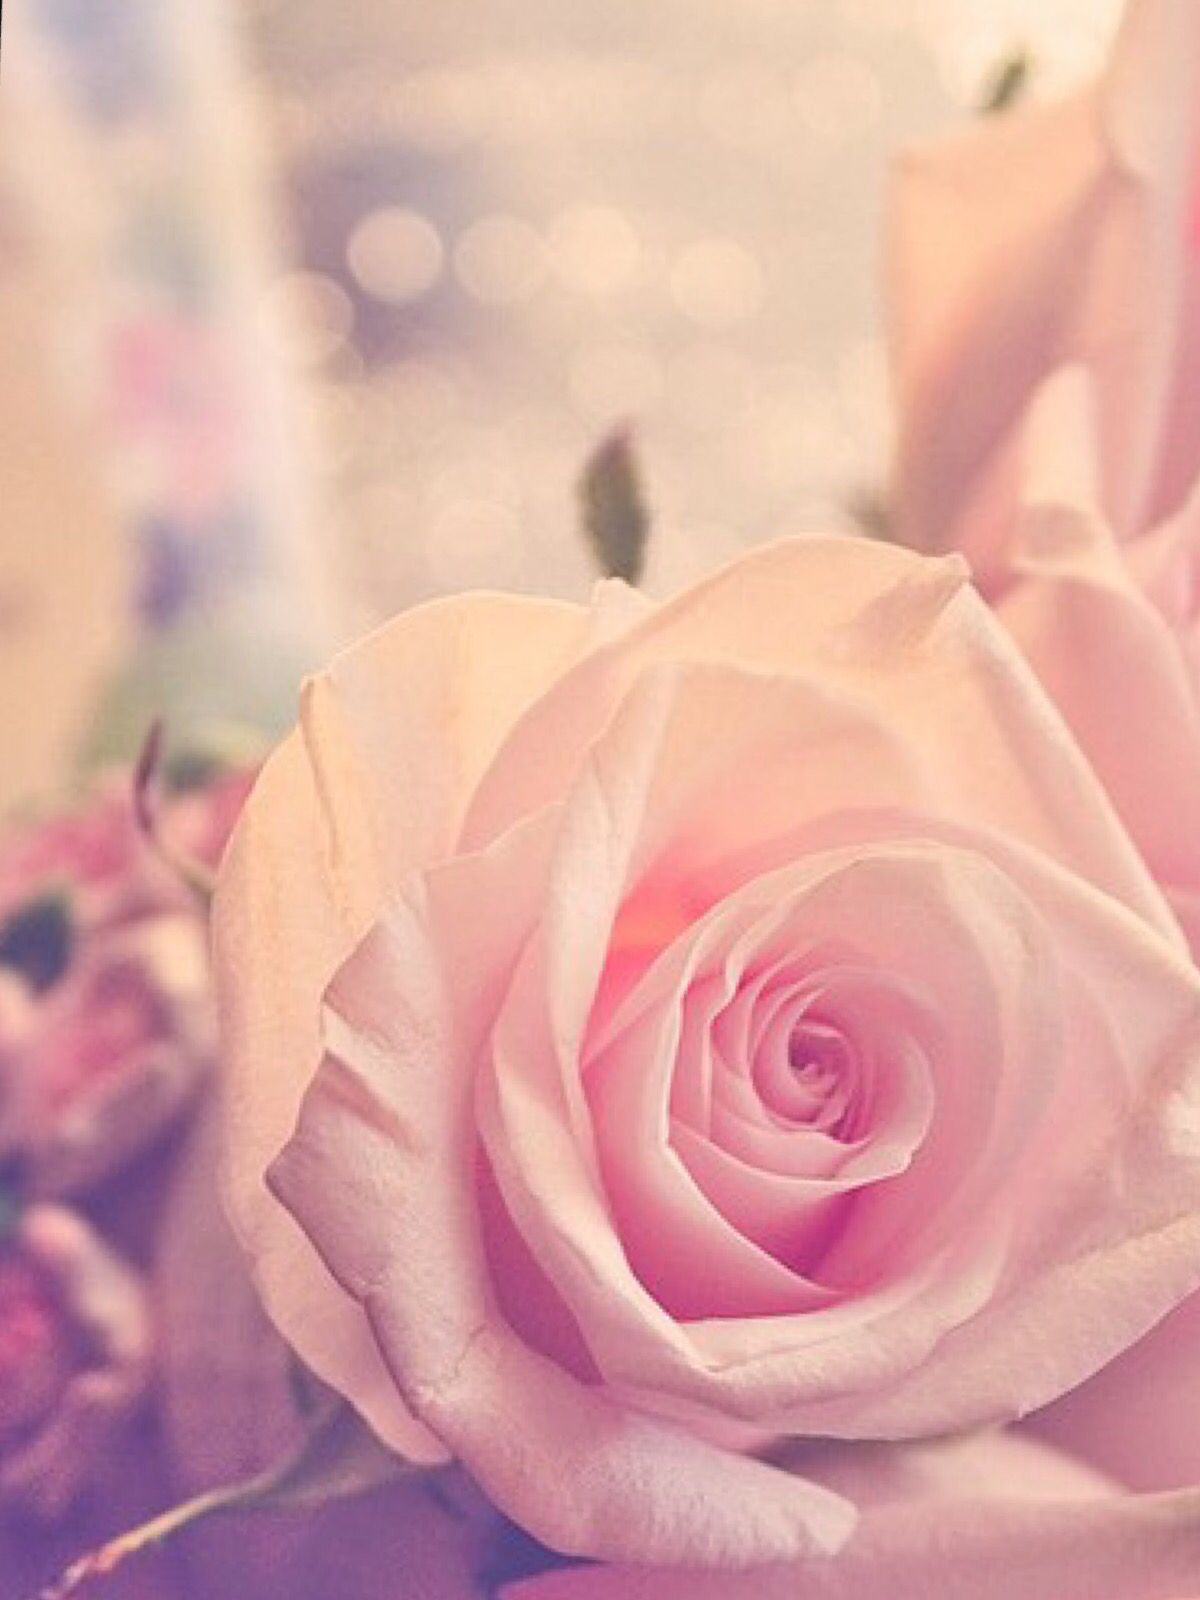 Cute Rose Wallpaper Wallpaper Marieghansen Cute Rose Rose Rose Gold Backgrounds